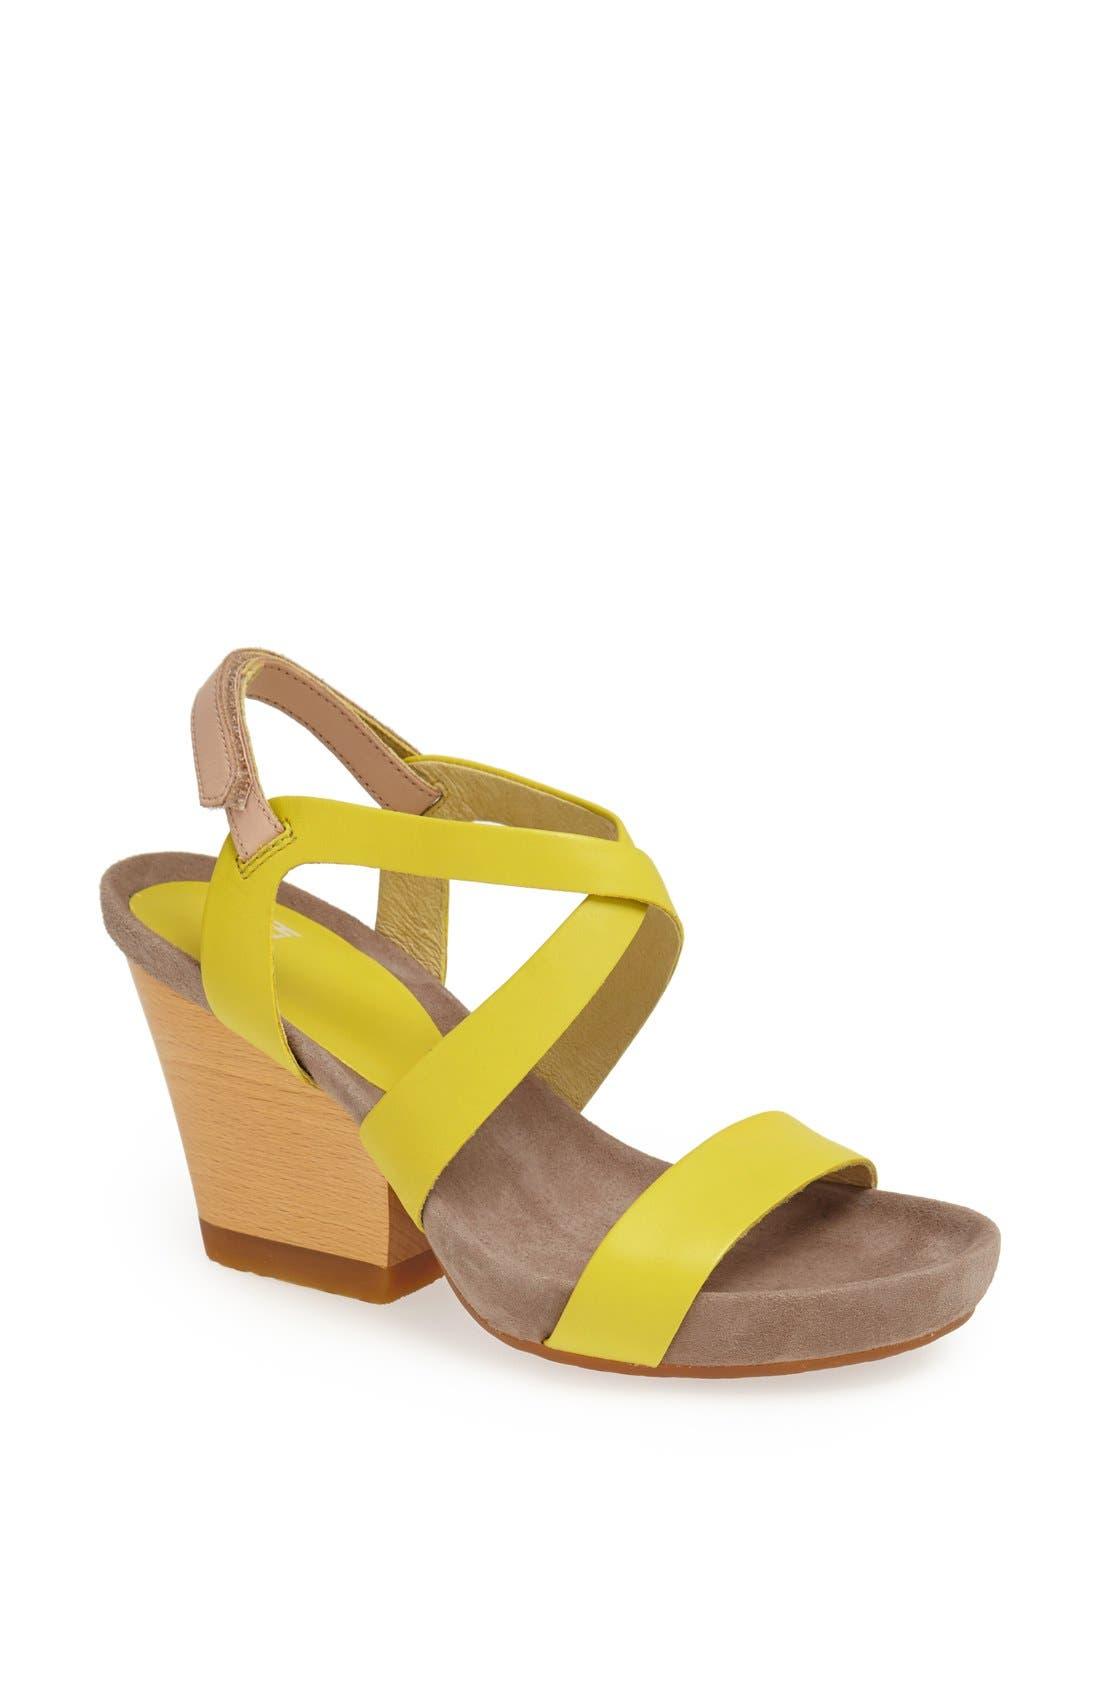 Alternate Image 1 Selected - Camper 'Allegra' Block Heel Sandal